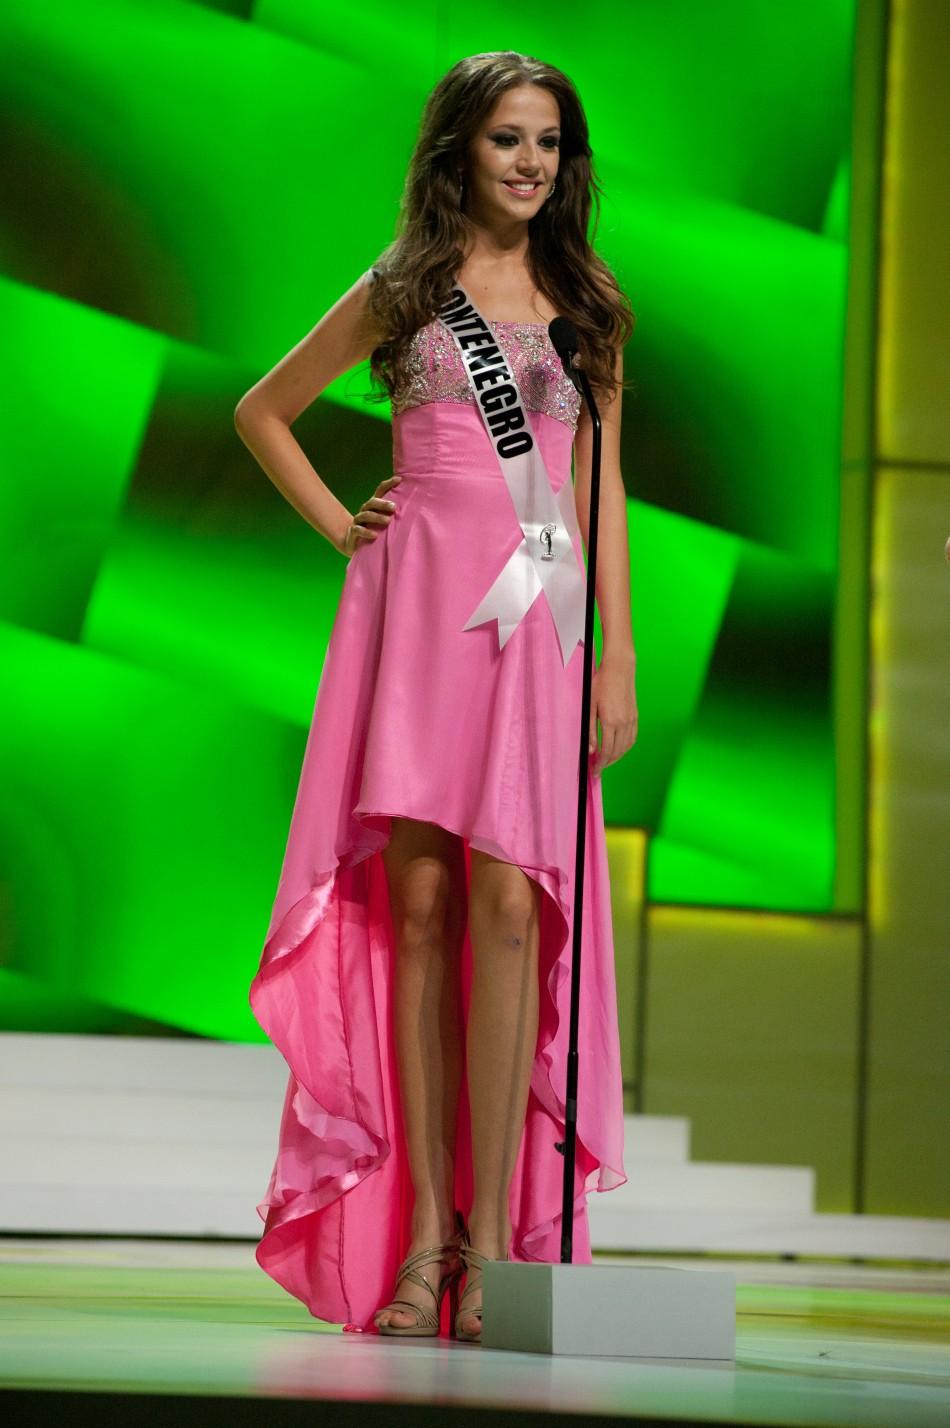 Miss Montenegro 2011, Nikolina Loncar won Miss Congeniality award